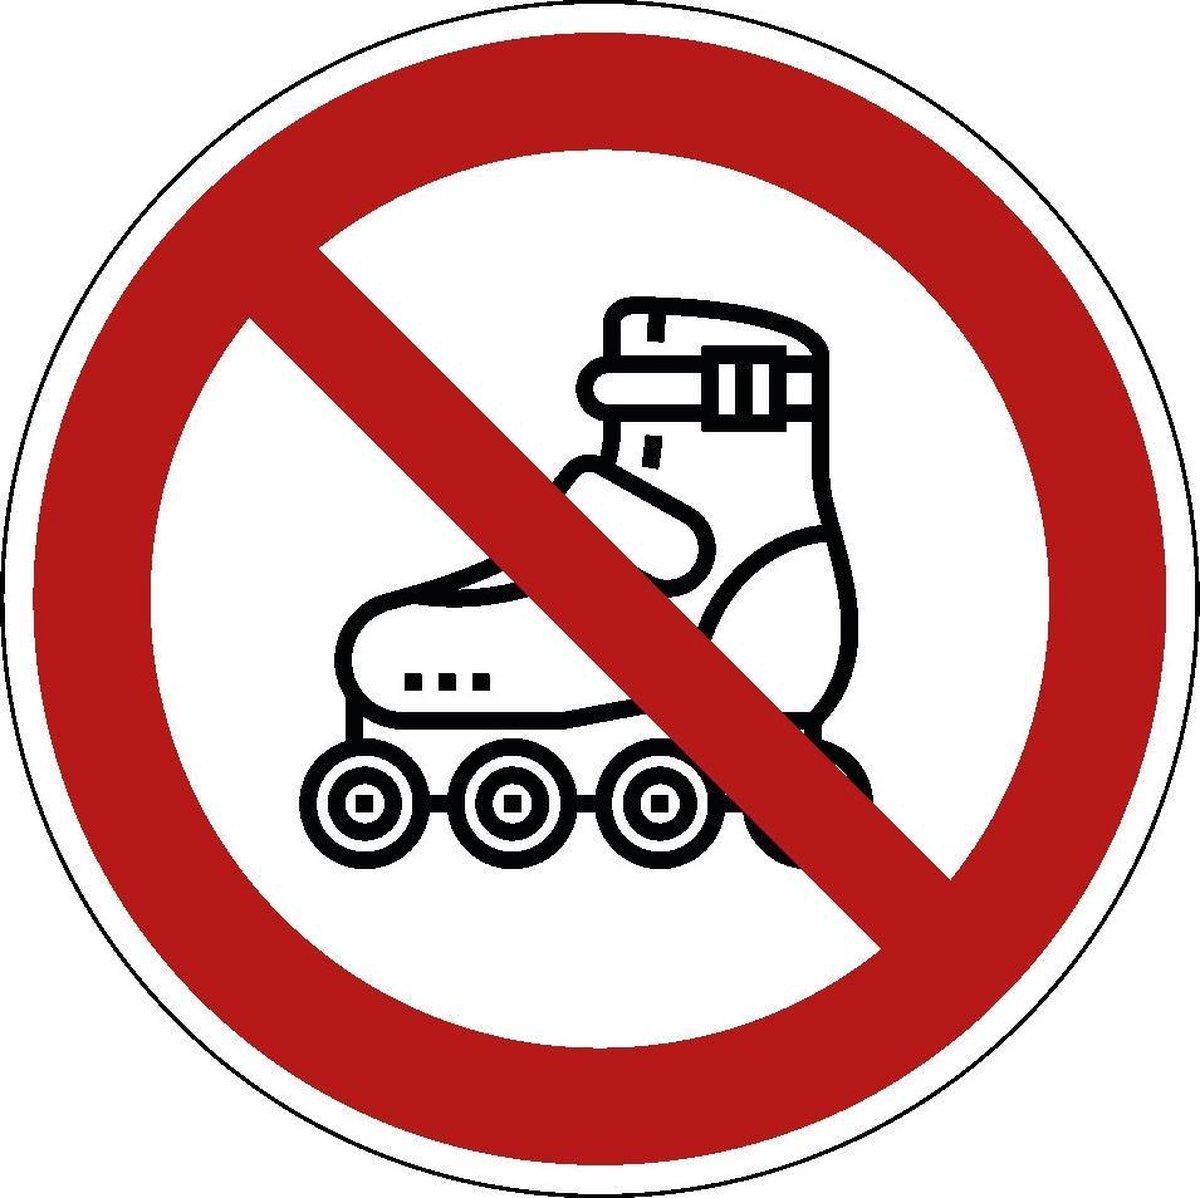 Verboden te skaten sticker 200 mm